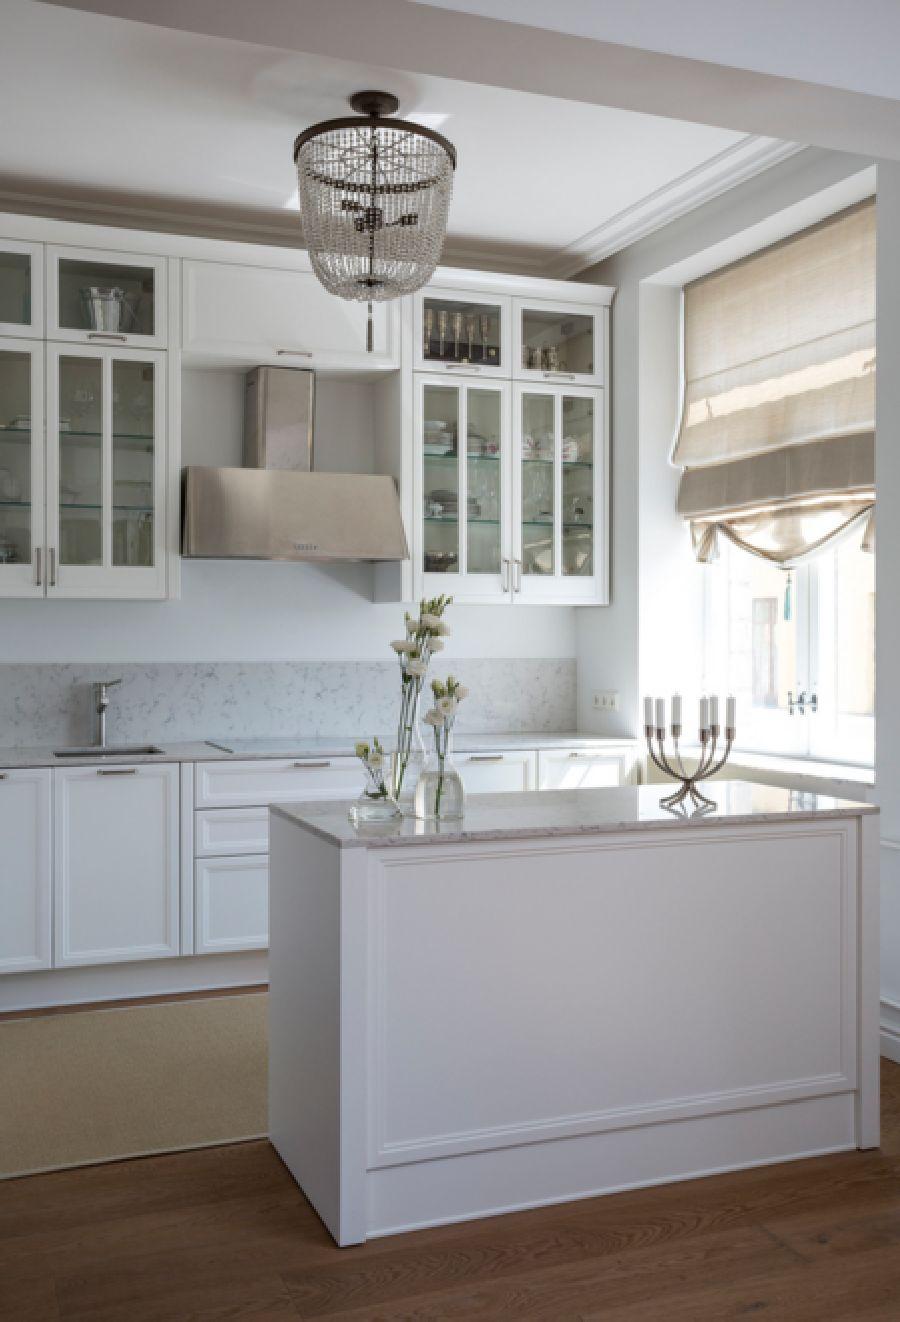 adelaparvu.com despre apartament de 80 mp patrati cu aer rustic elegant, locuinta Rusia, designer Zhenya Zhdanova (6)